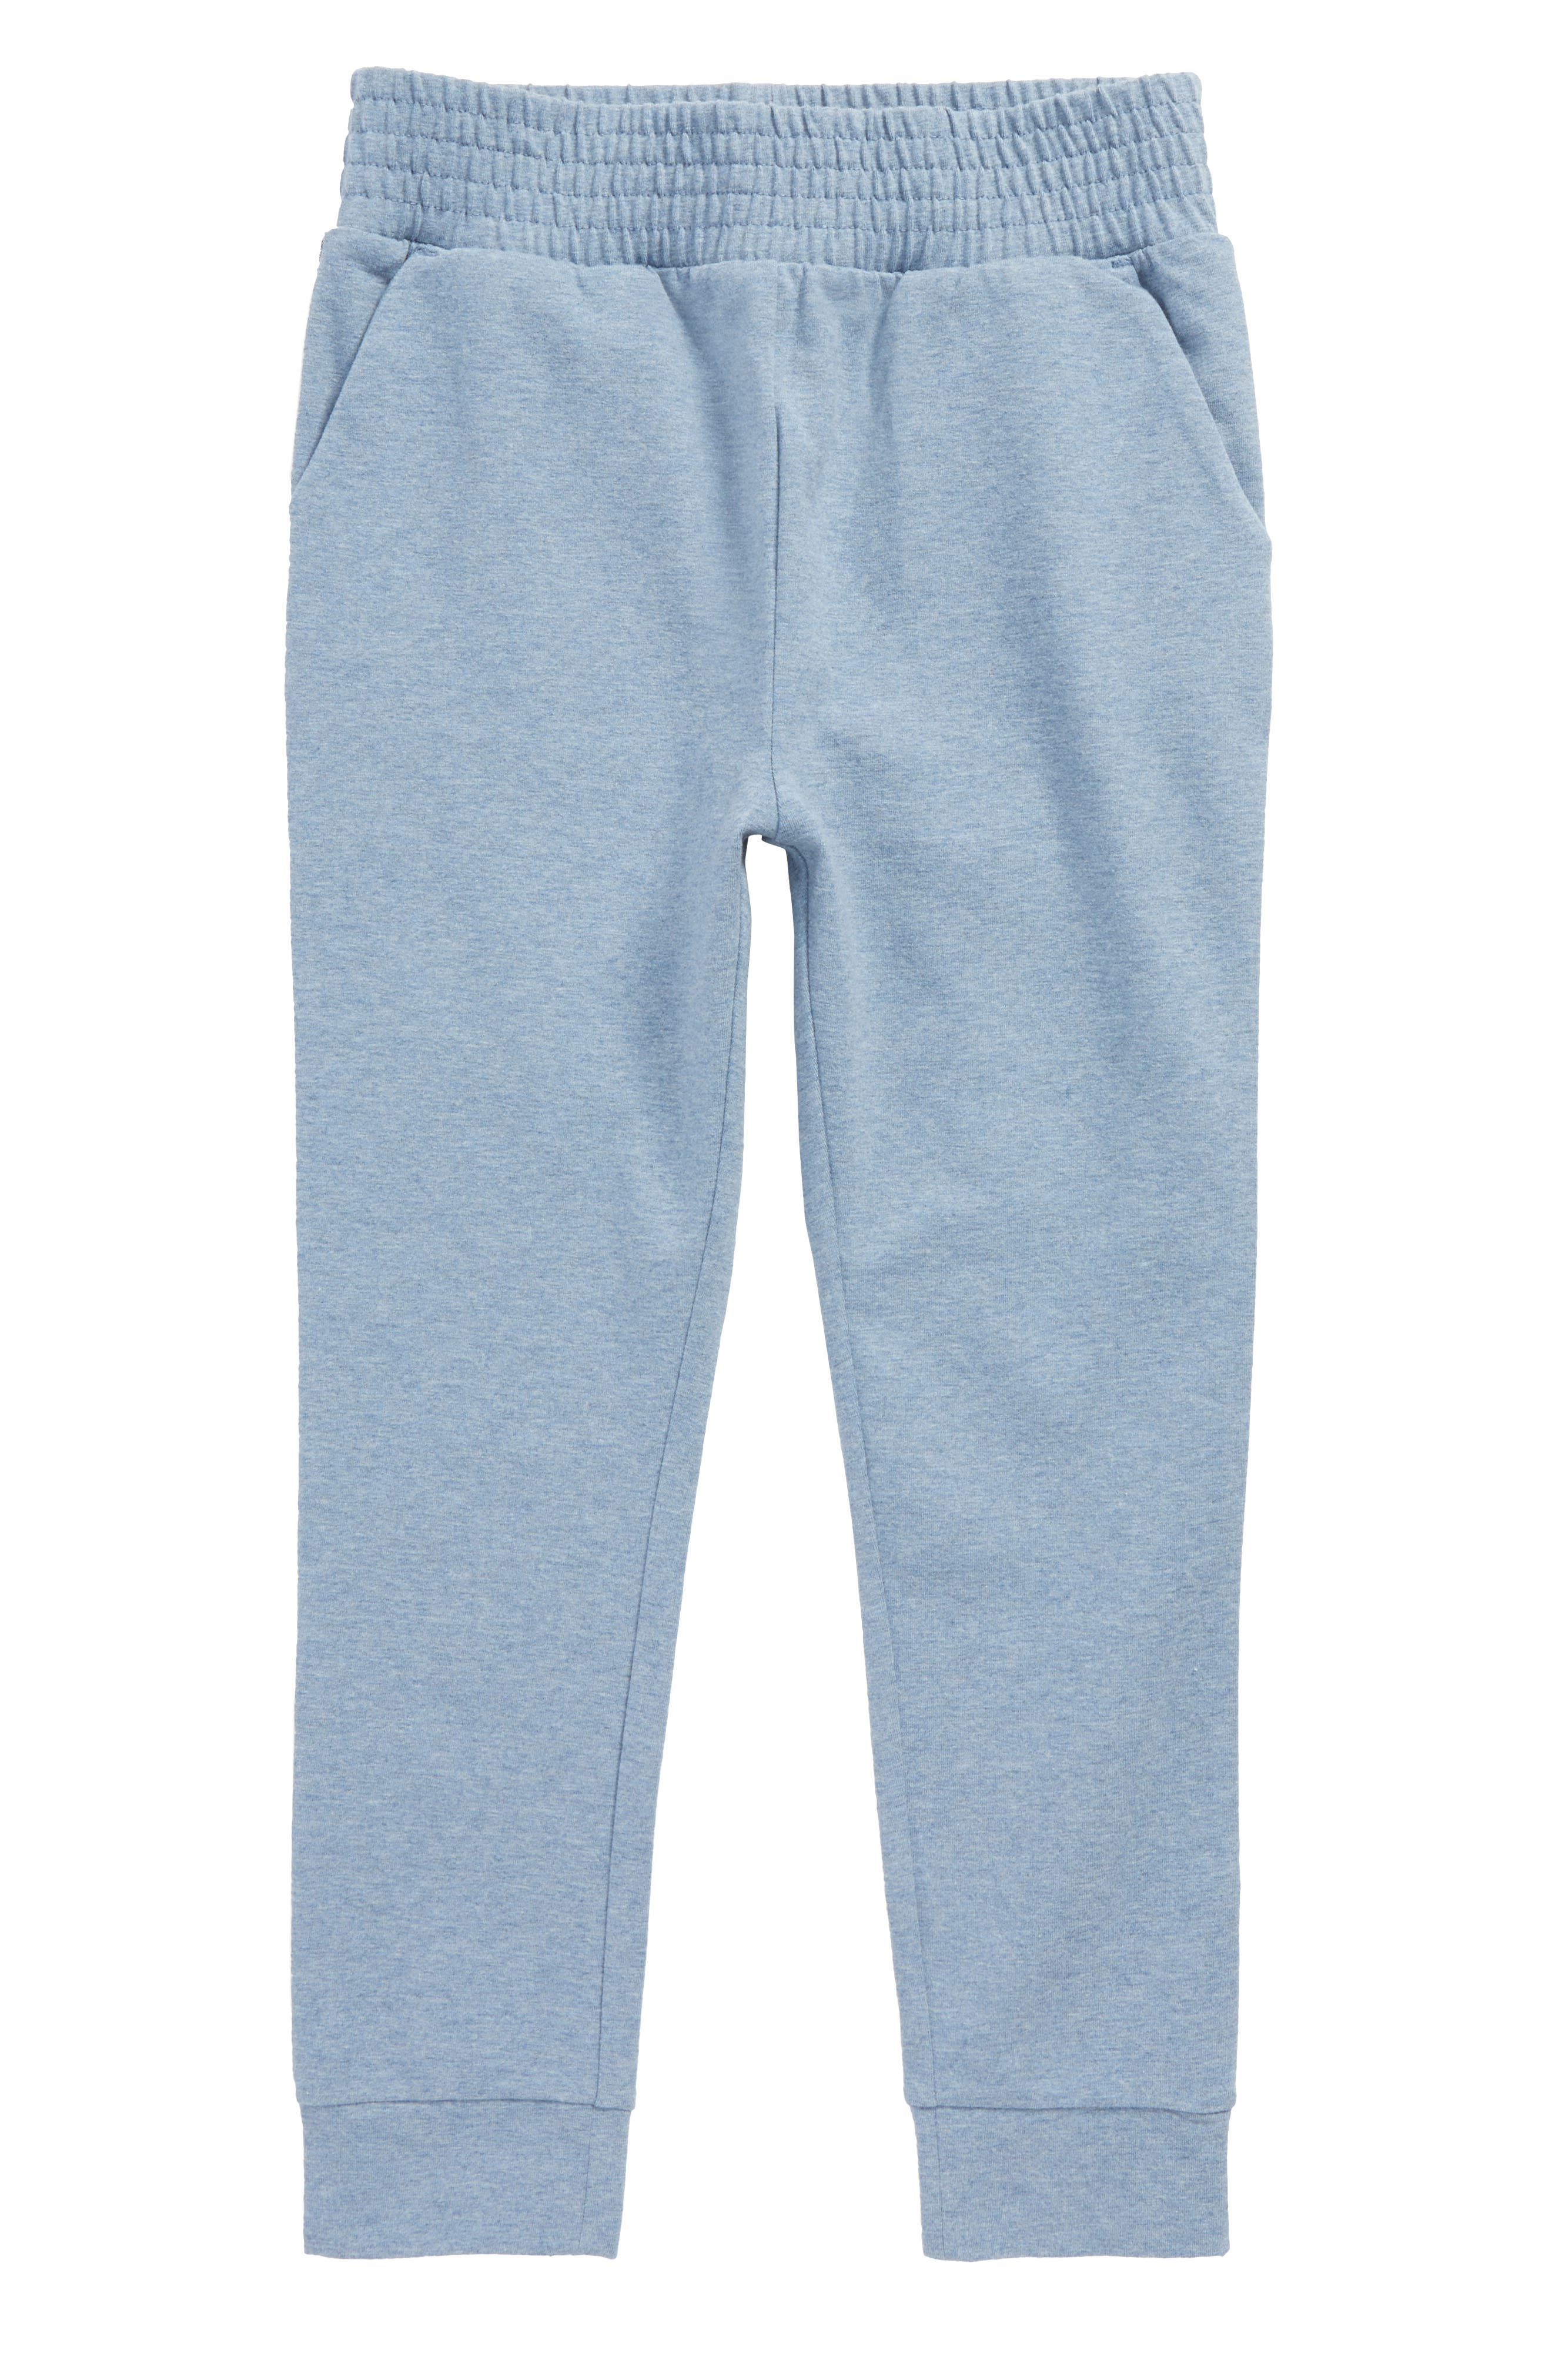 Tea Collection Tuxedo Stripe Jogger Pants (Toddler Girls, Little Girls & Big Girls)